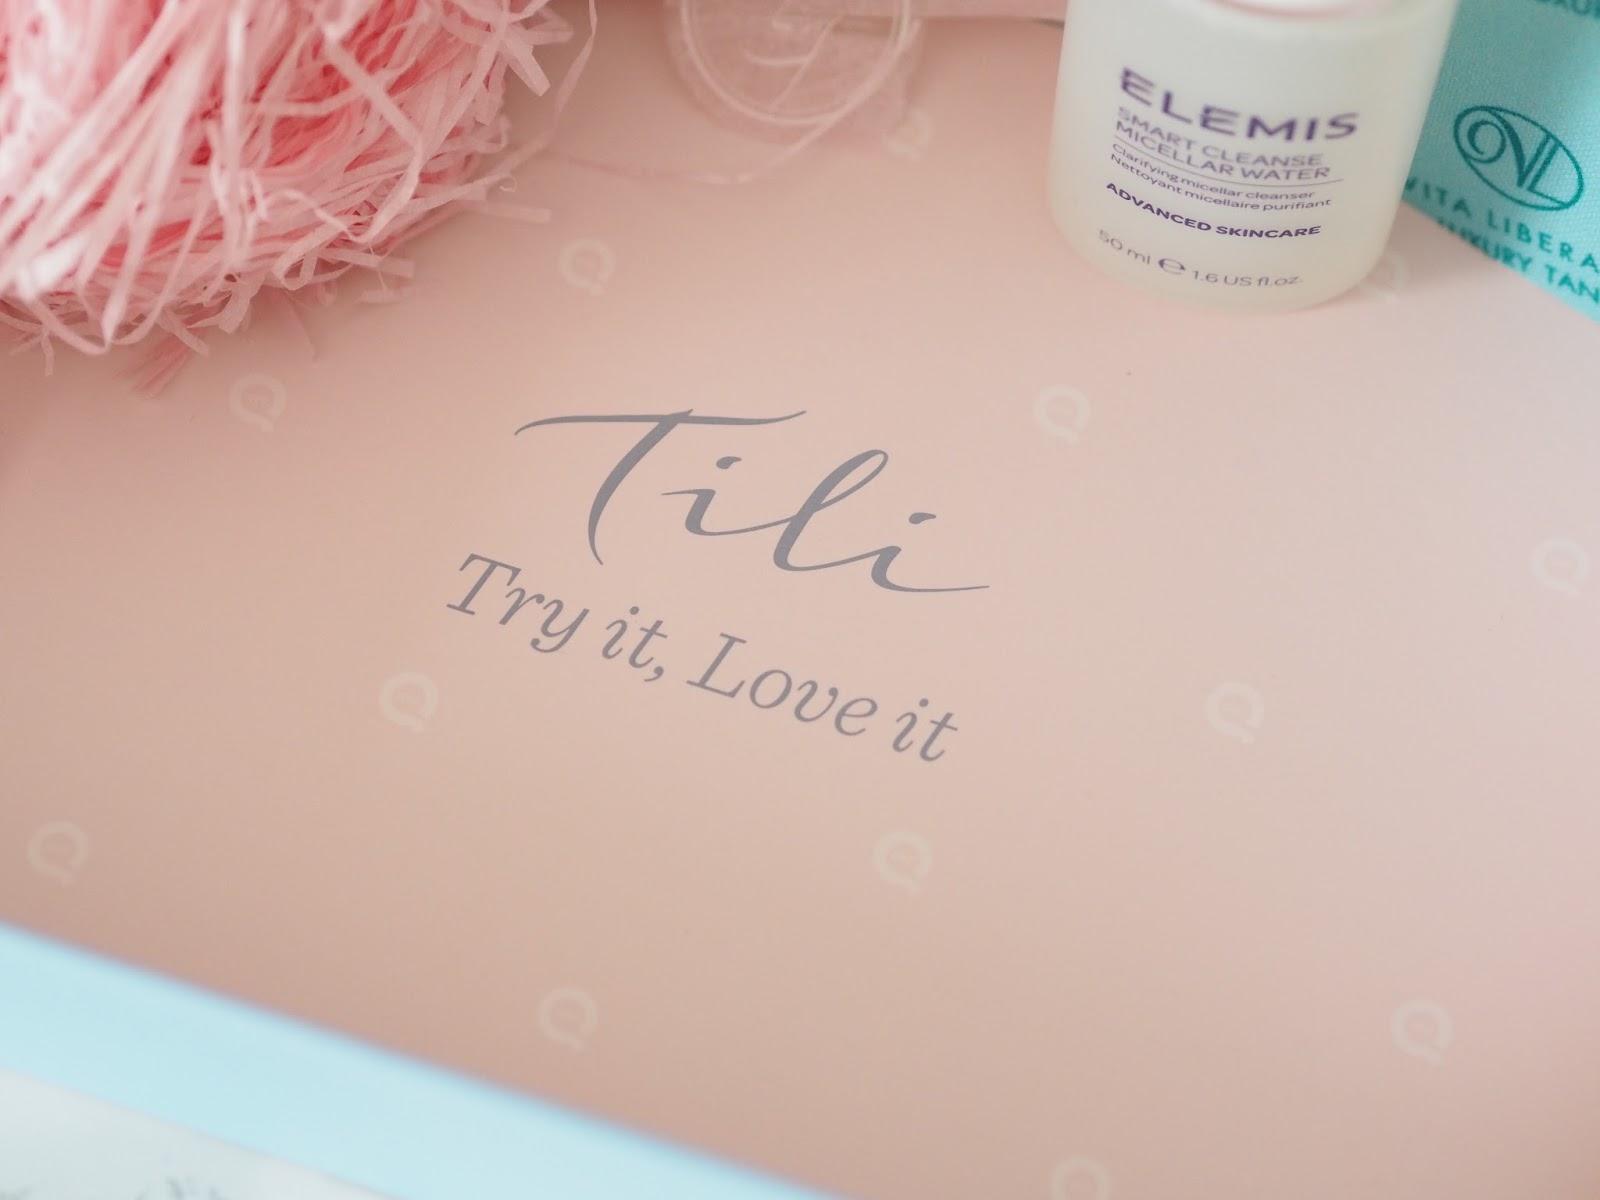 TILI beauty box QVC review